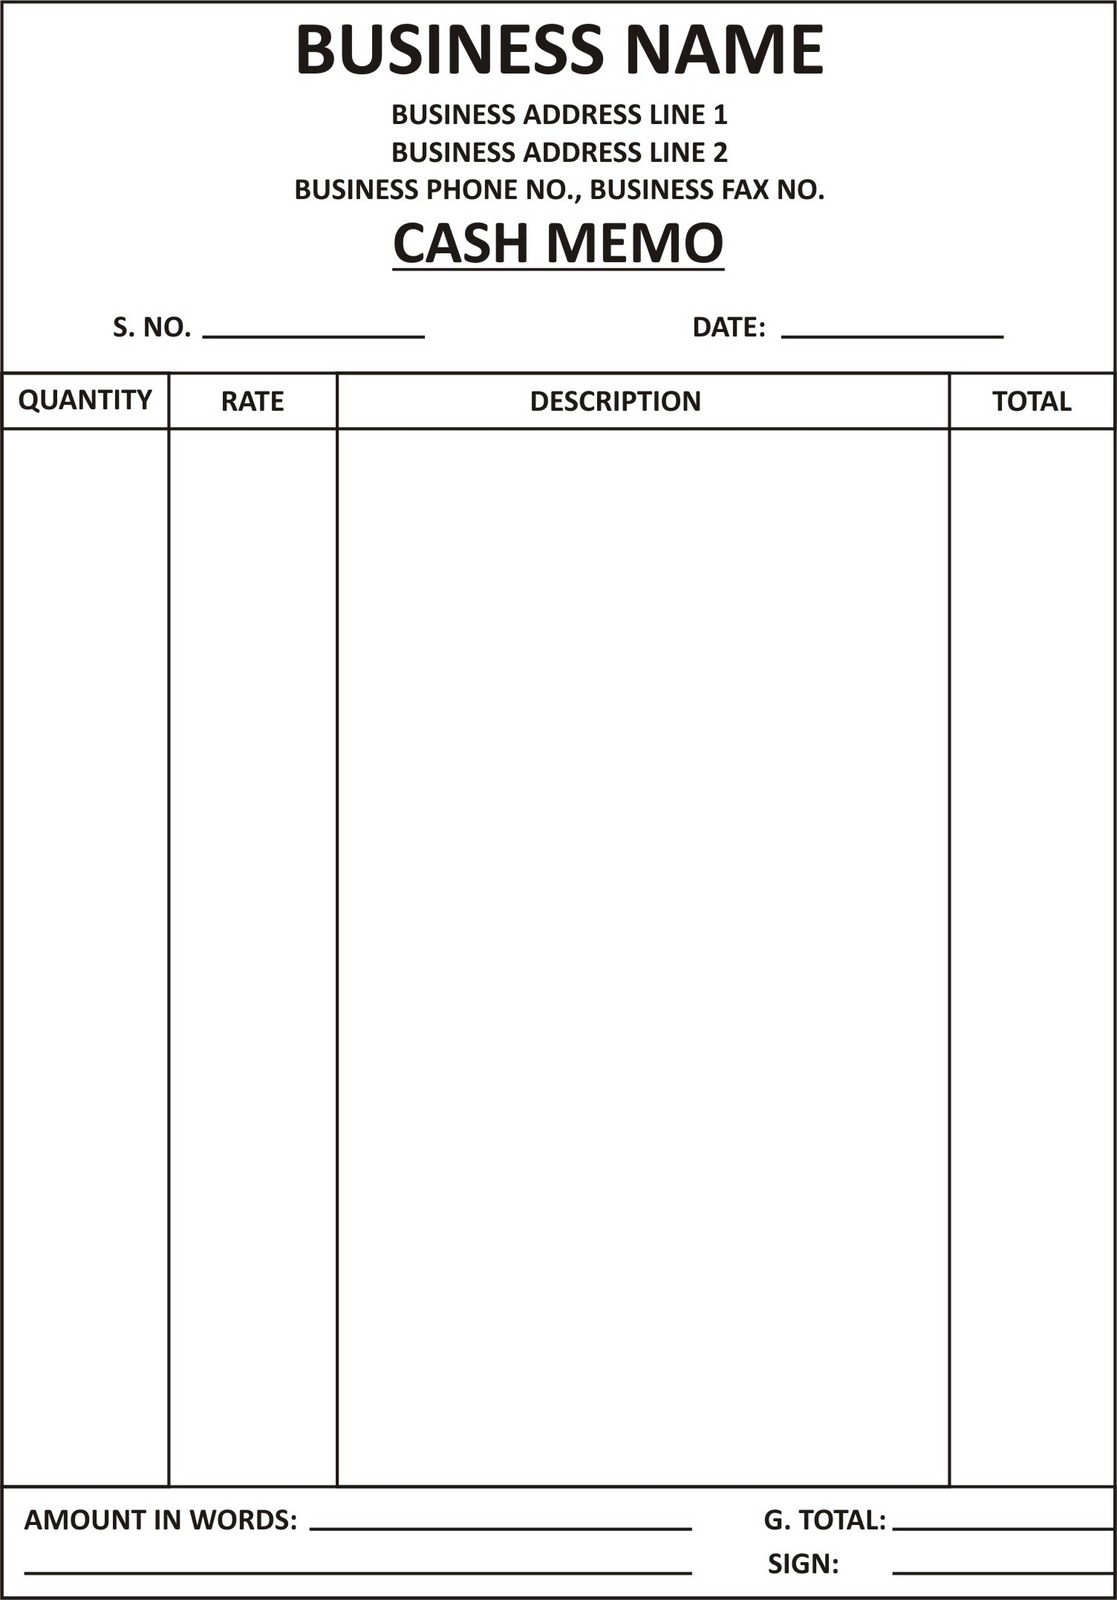 simple tax invoice template. invoice template quotation template, Invoice templates